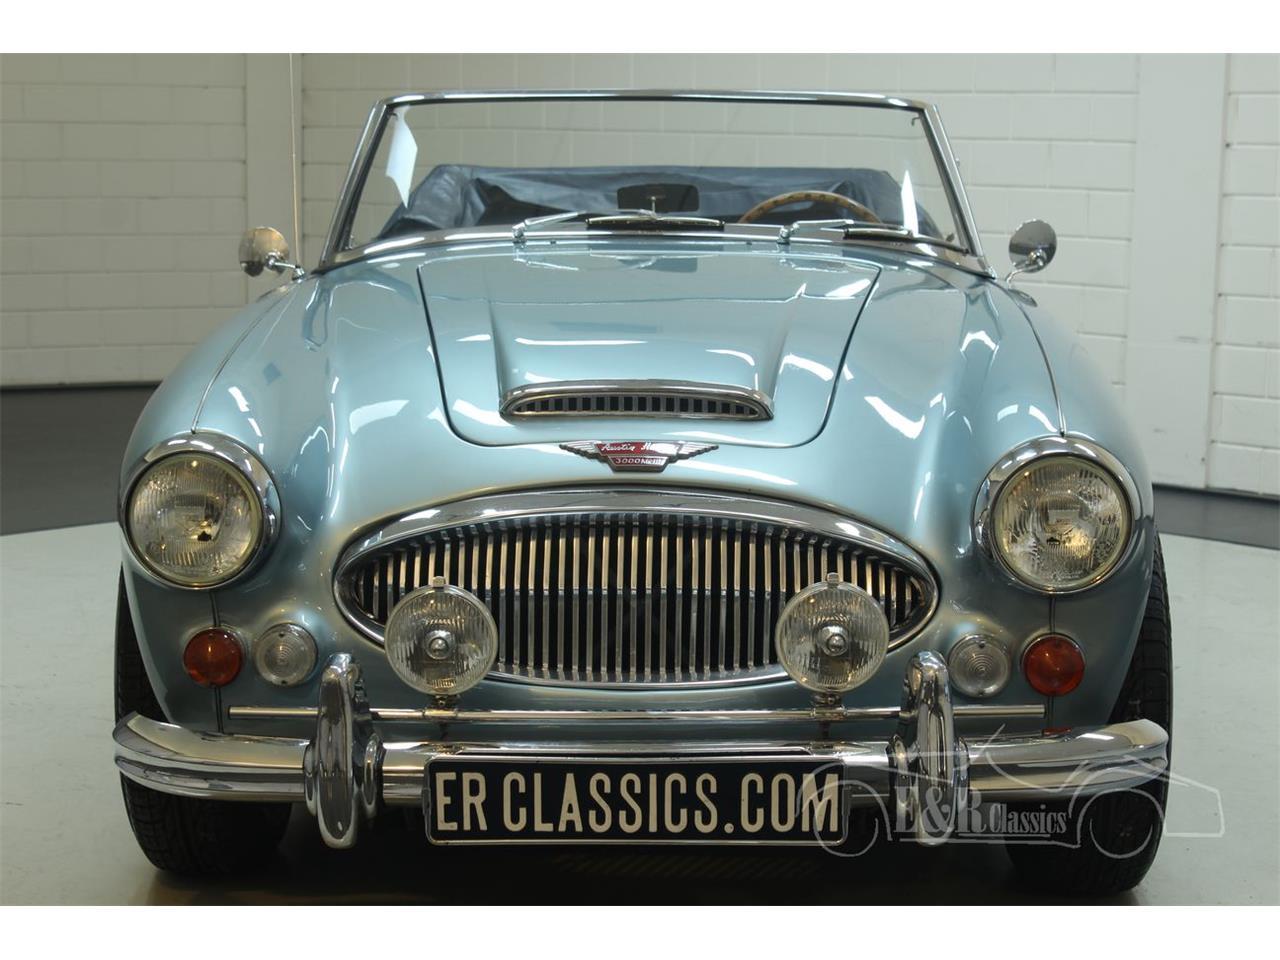 1967 Austin-Healey 3000 Mark III (CC-1302421) for sale in Waalwijk, Noord-Brabant